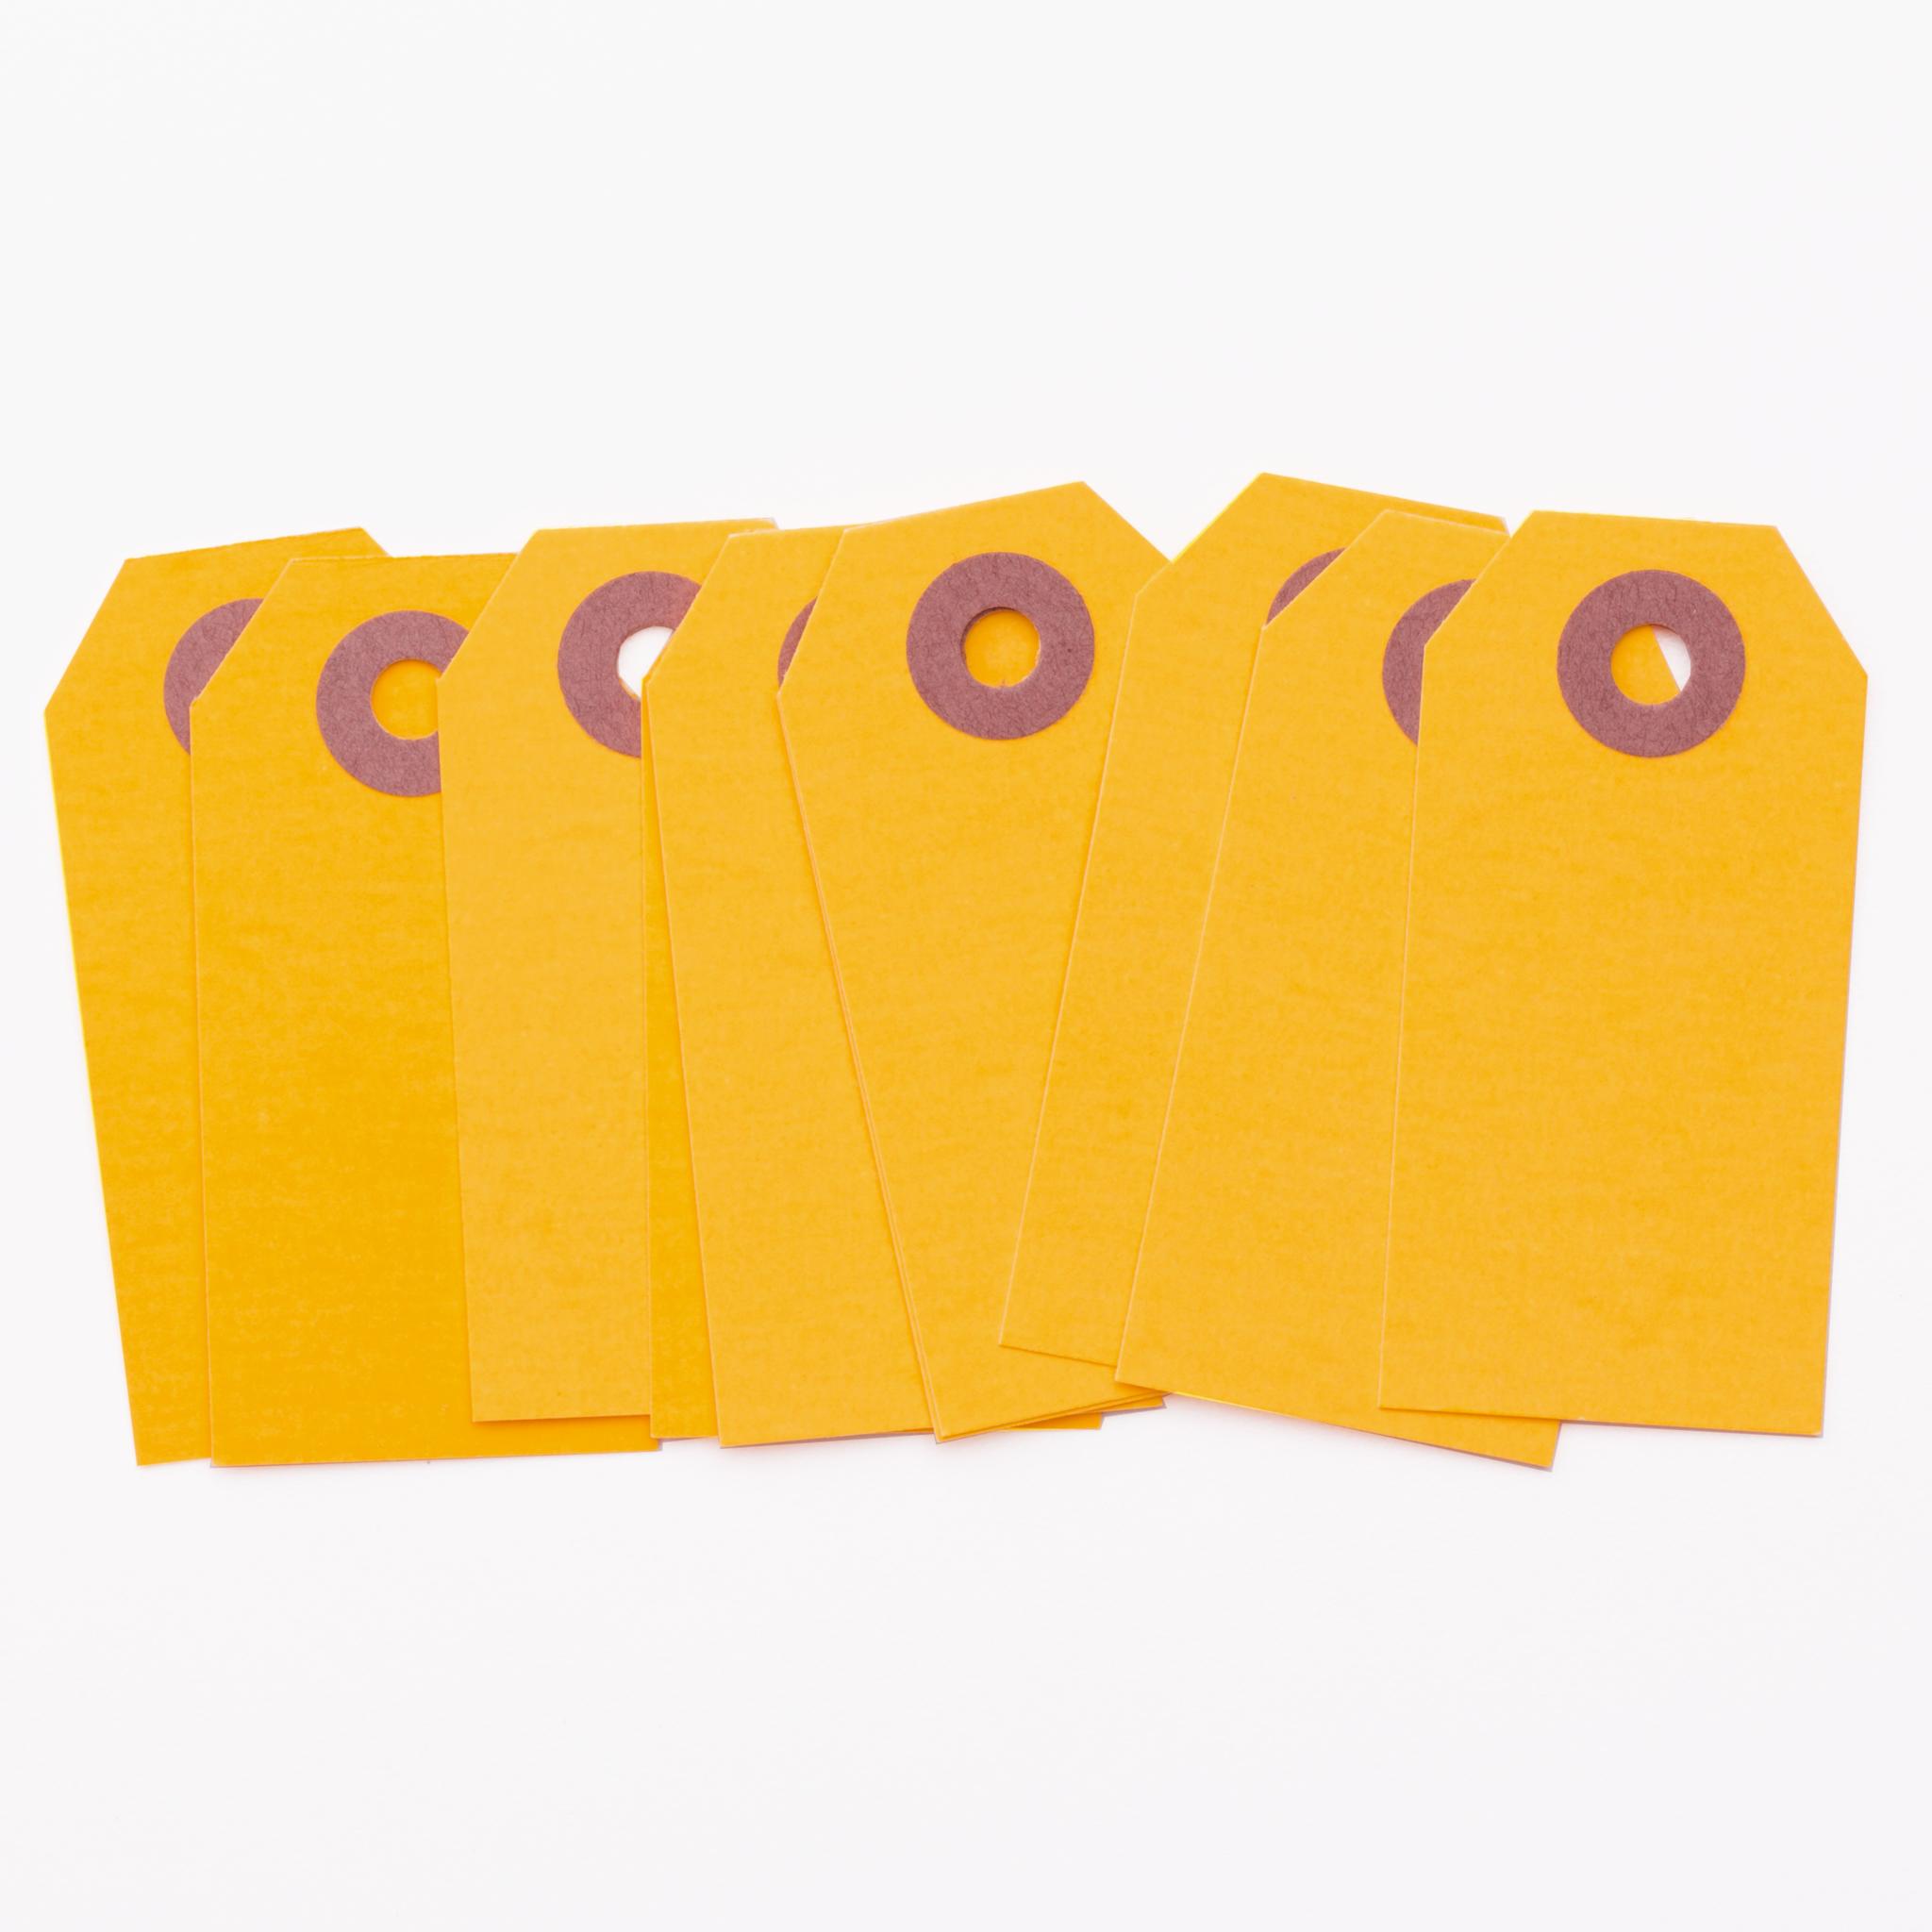 Neon Tangerine Parcel Tags